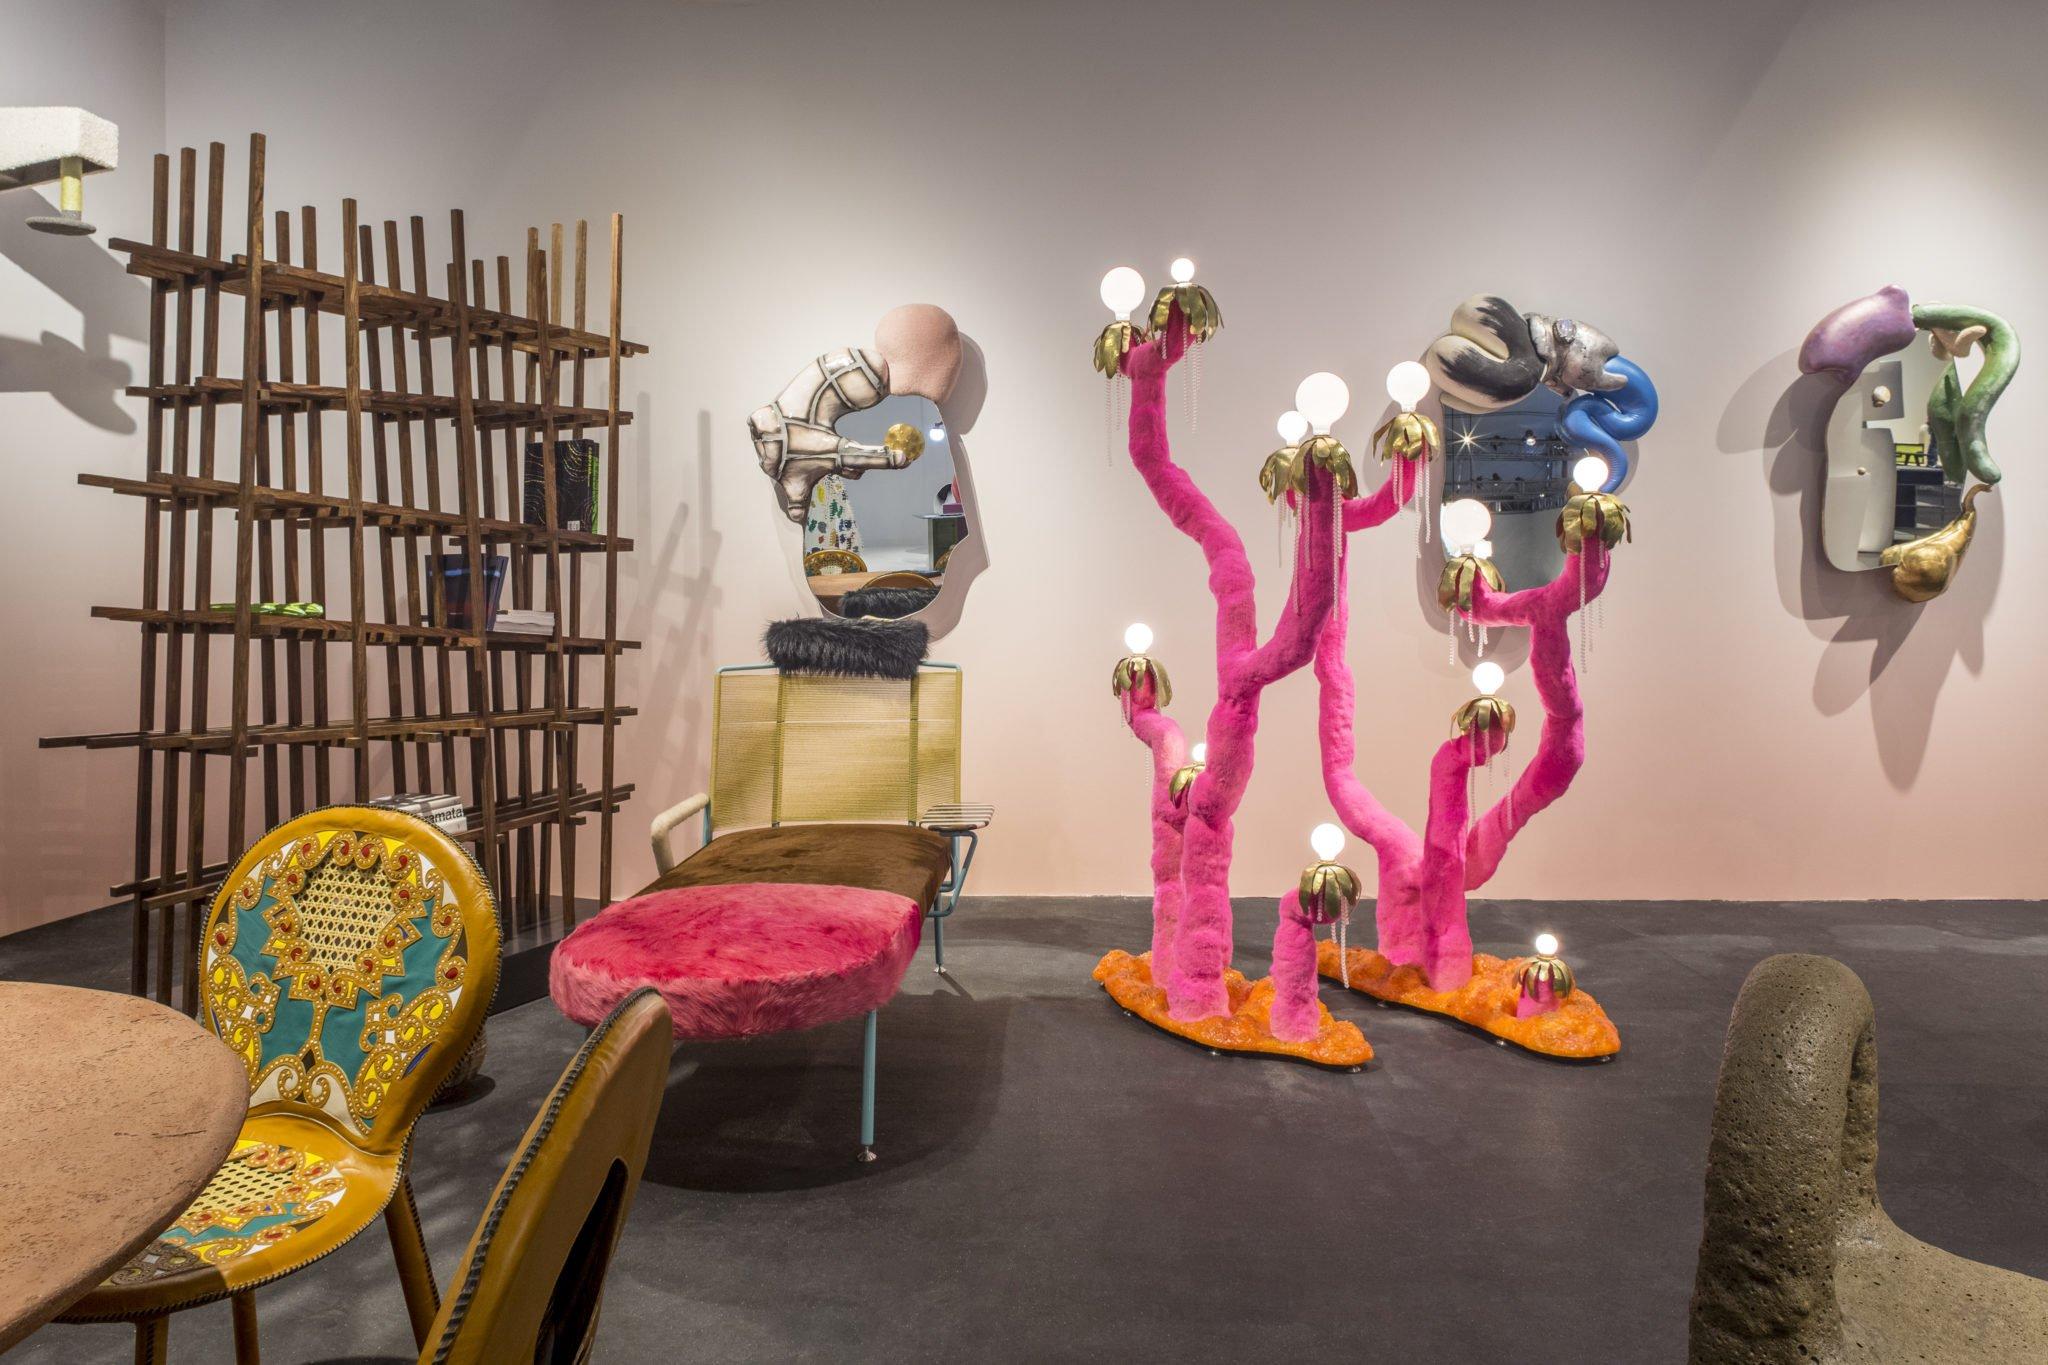 Design Miami 2019, Friedman Benda booth